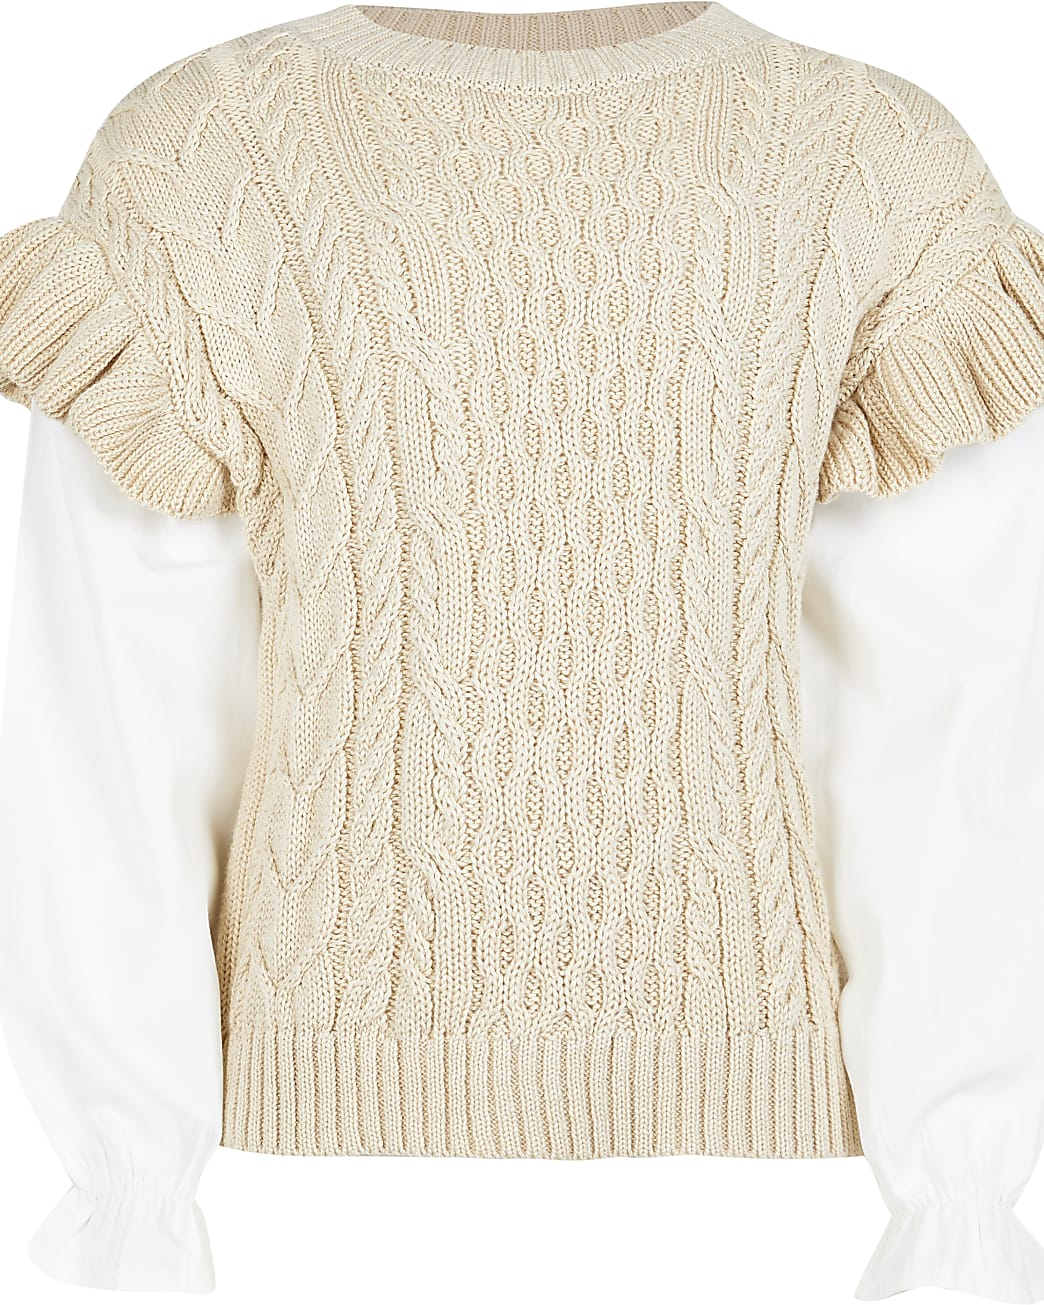 Girls beige frill 2 in 1 jumper